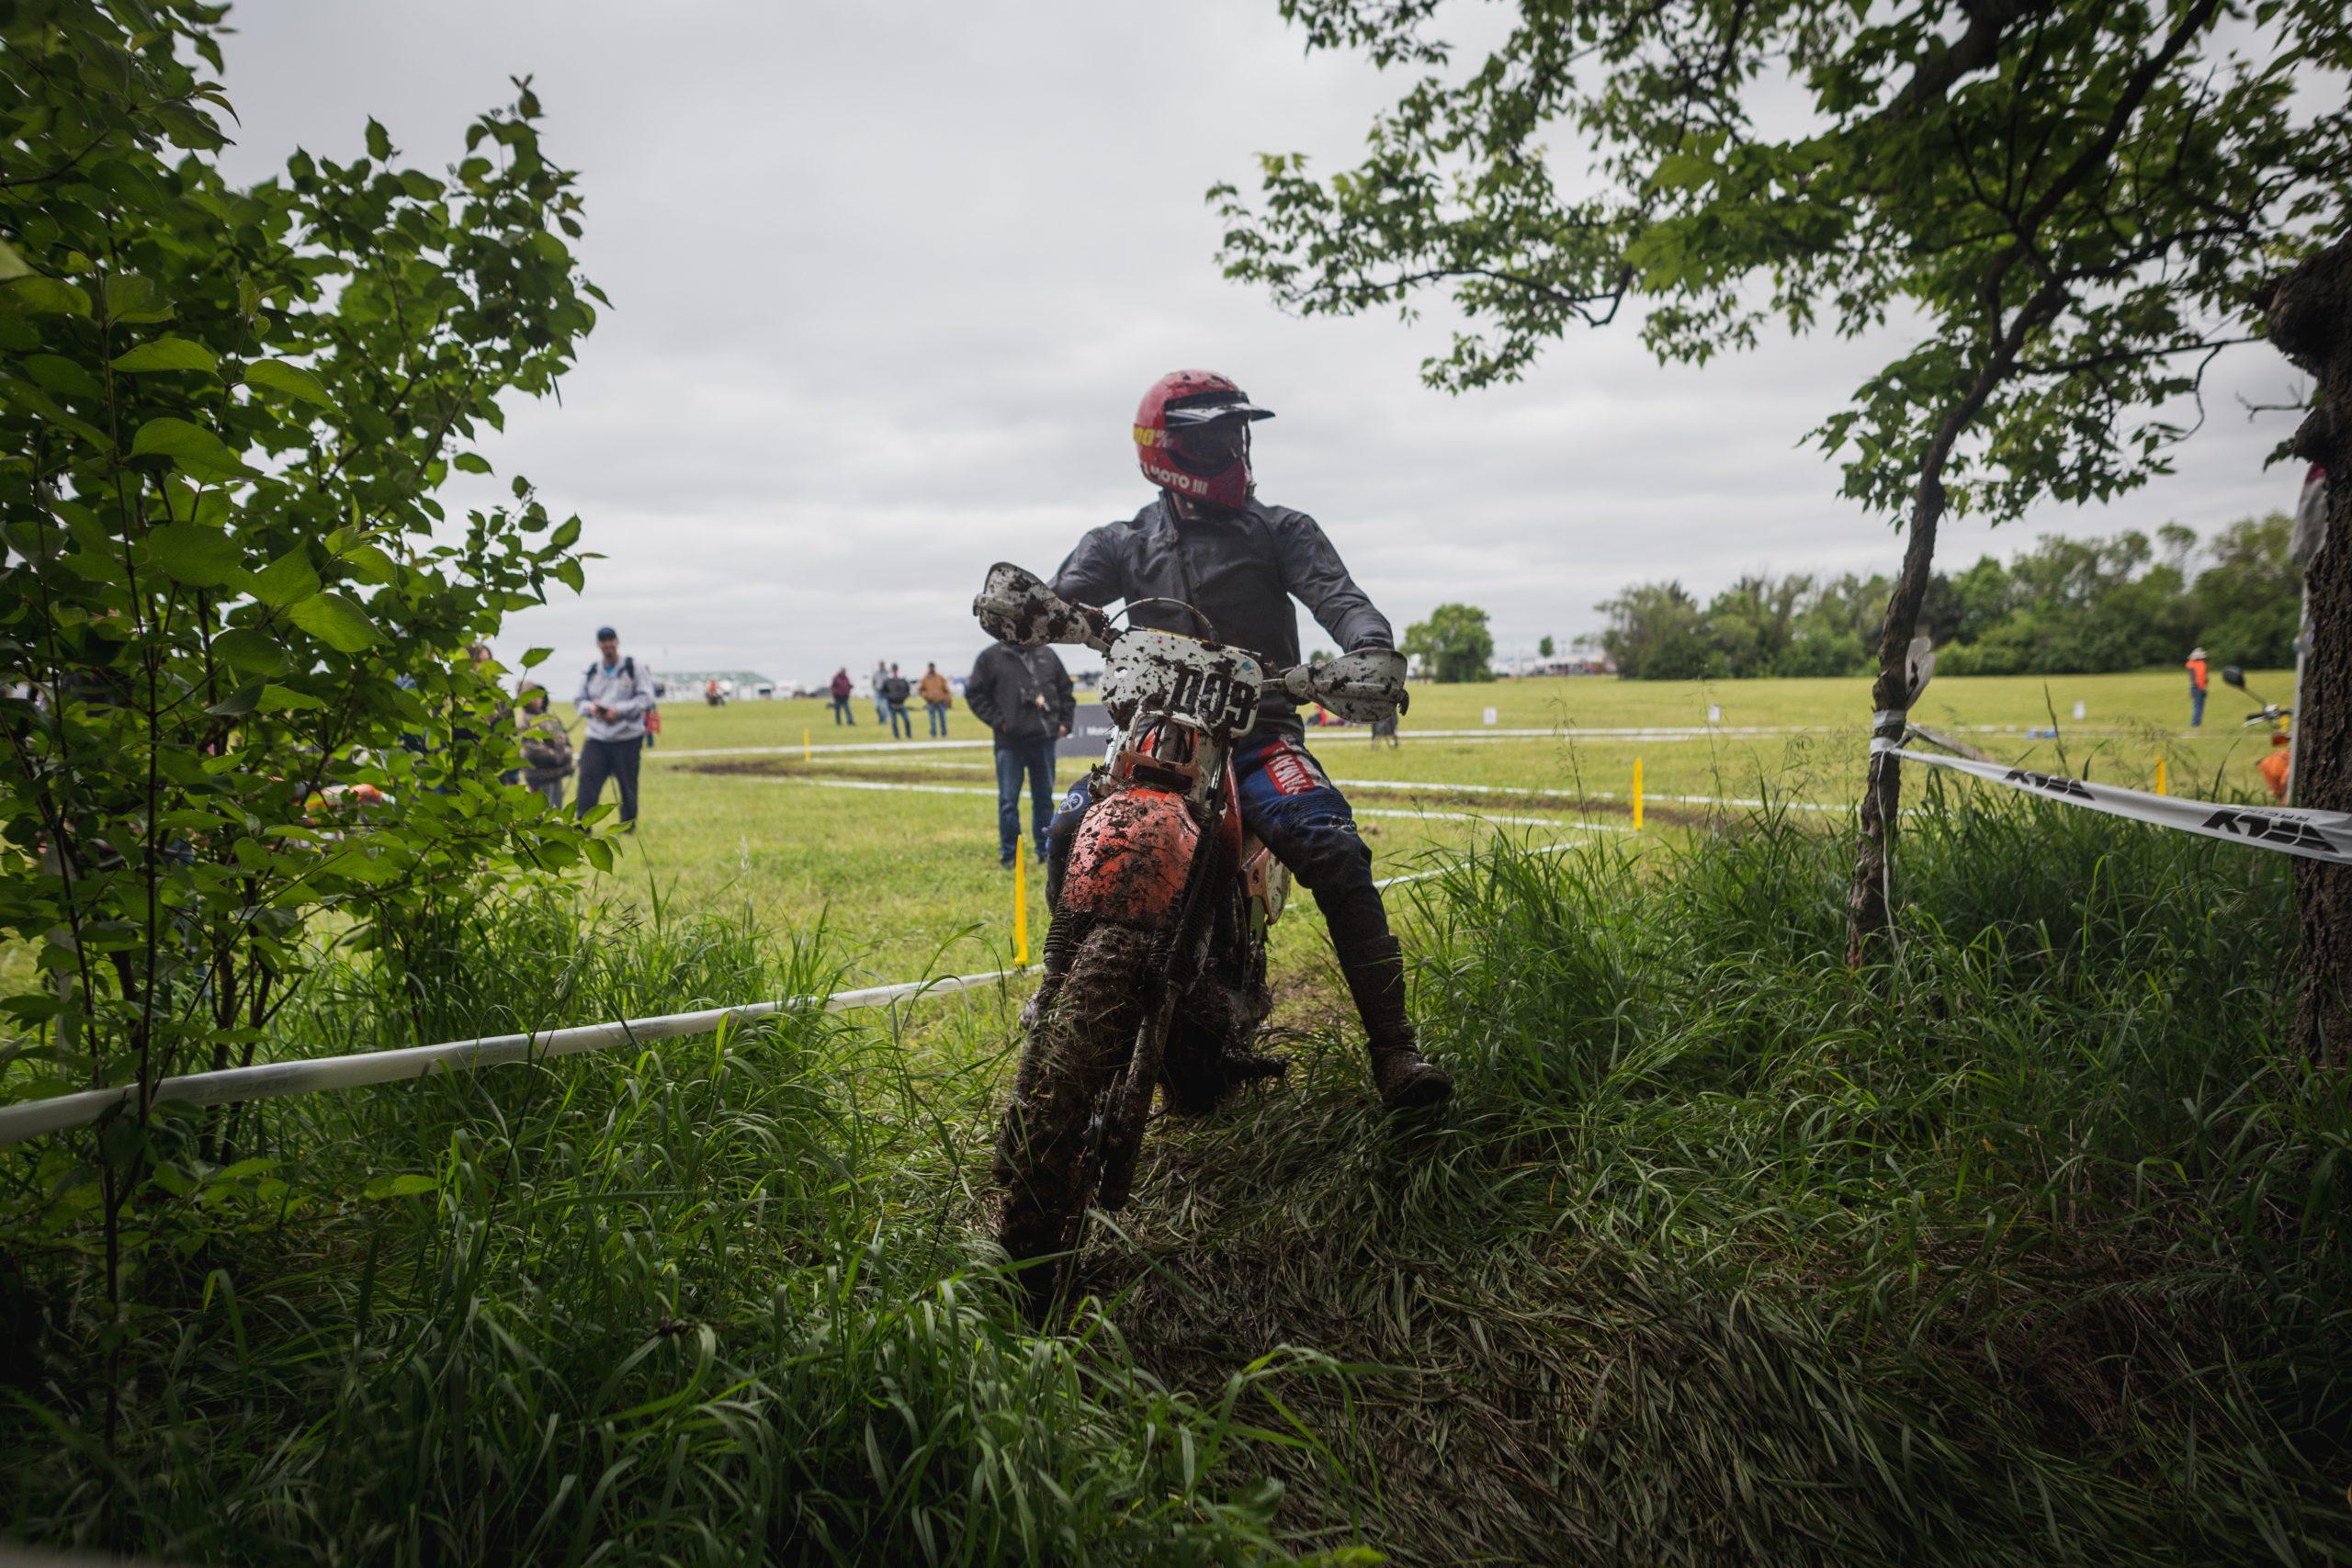 heartland motofest Kyle Smith cross country corner